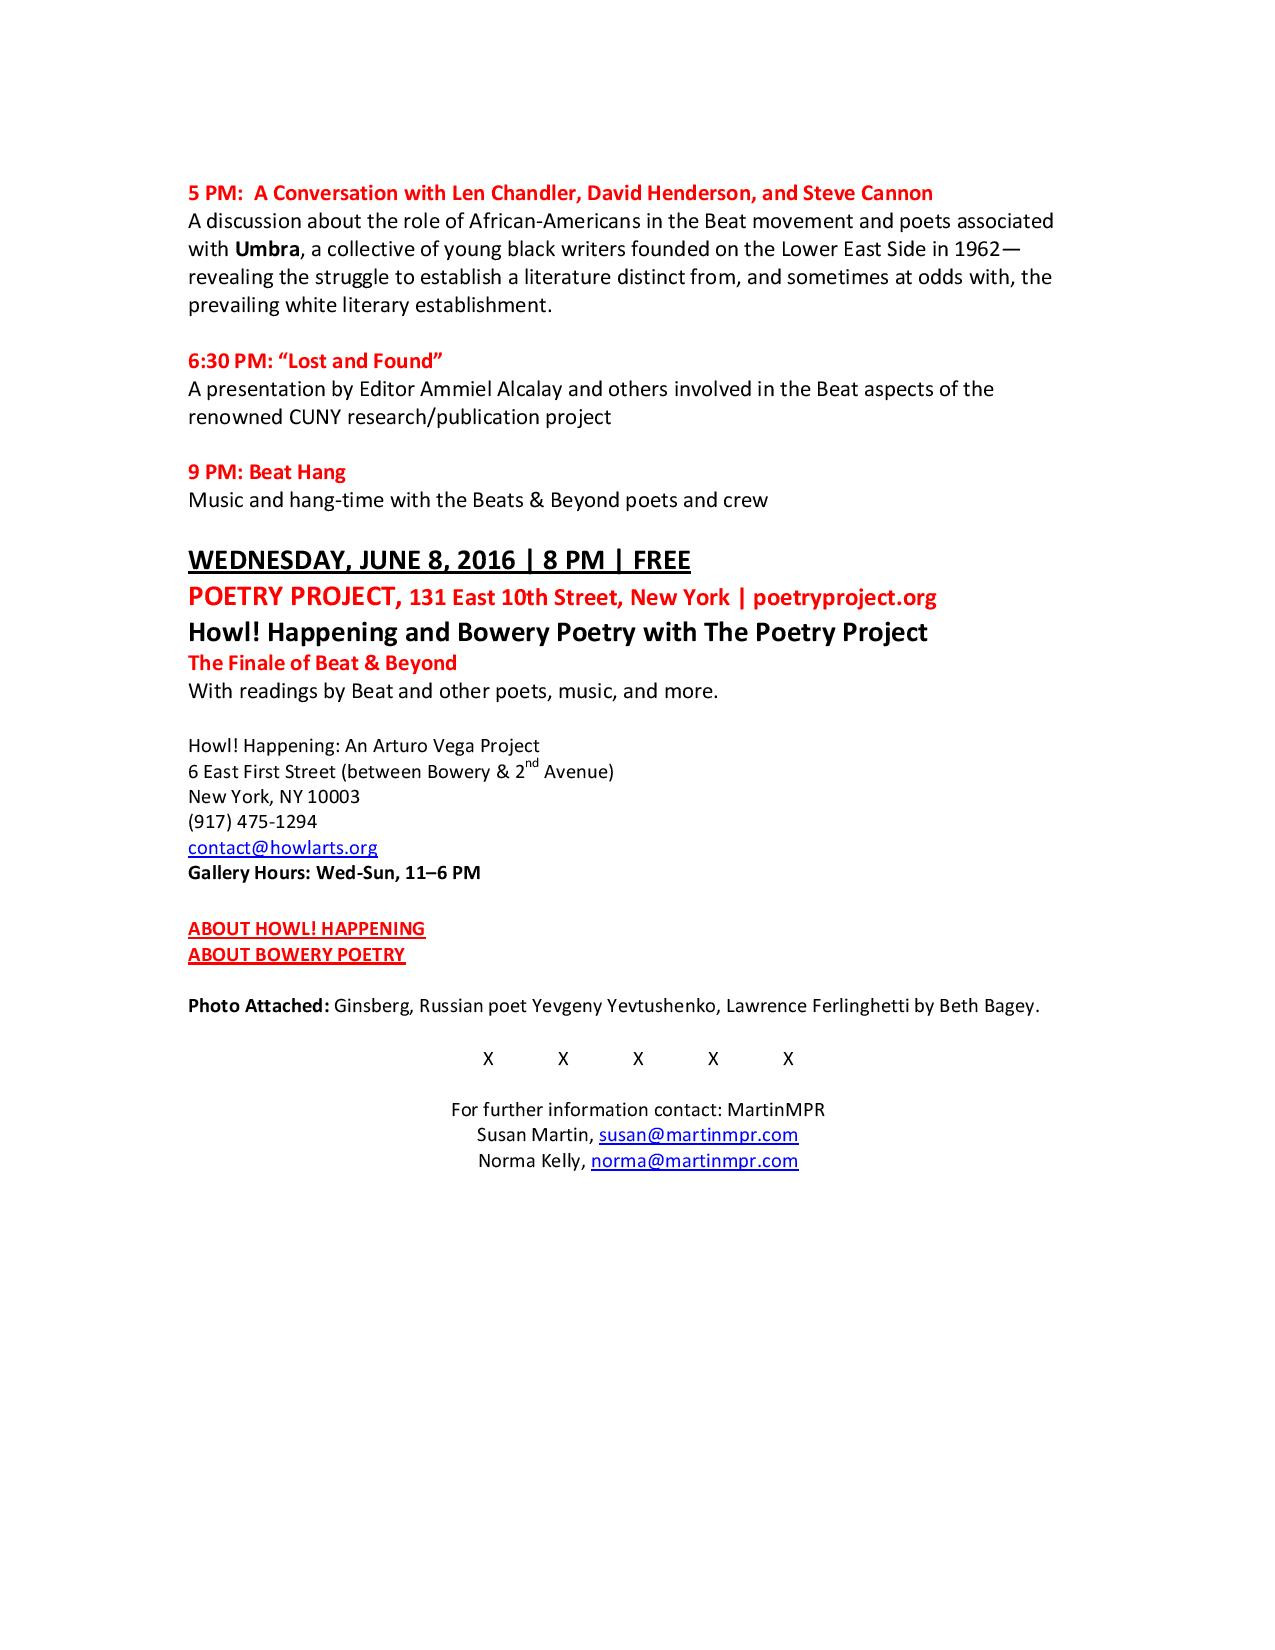 Beat&Beyond PR.050816v2-page-006